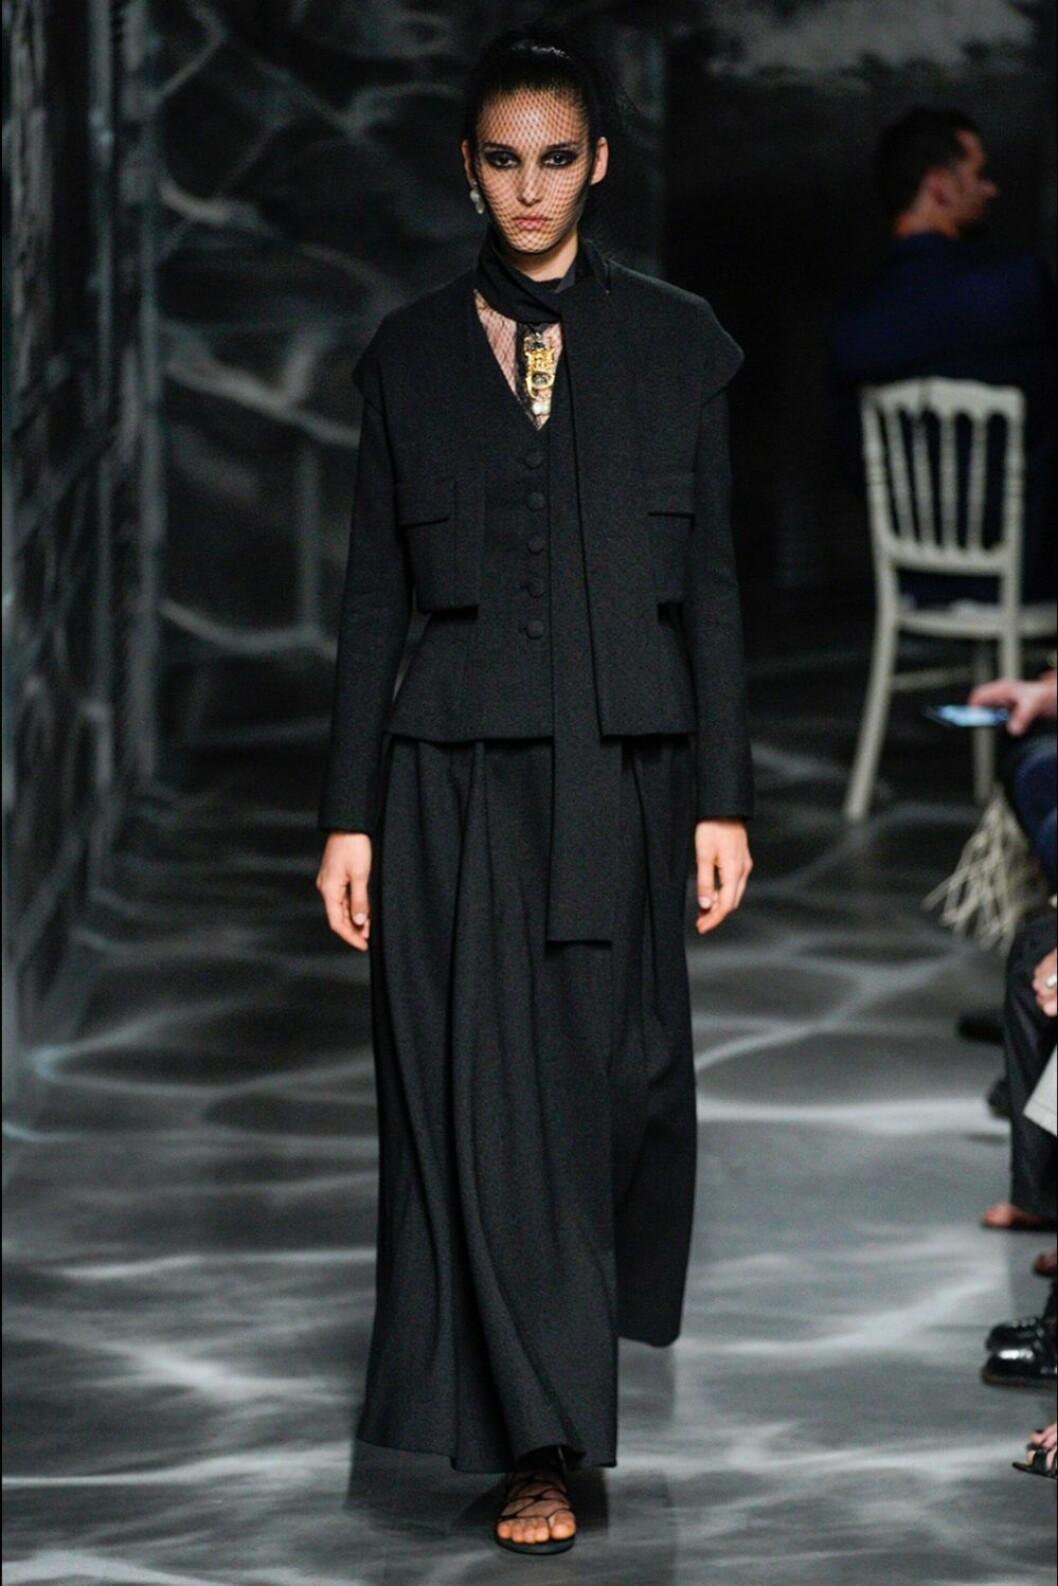 Christian Dior AW19/20, svart kostymset.